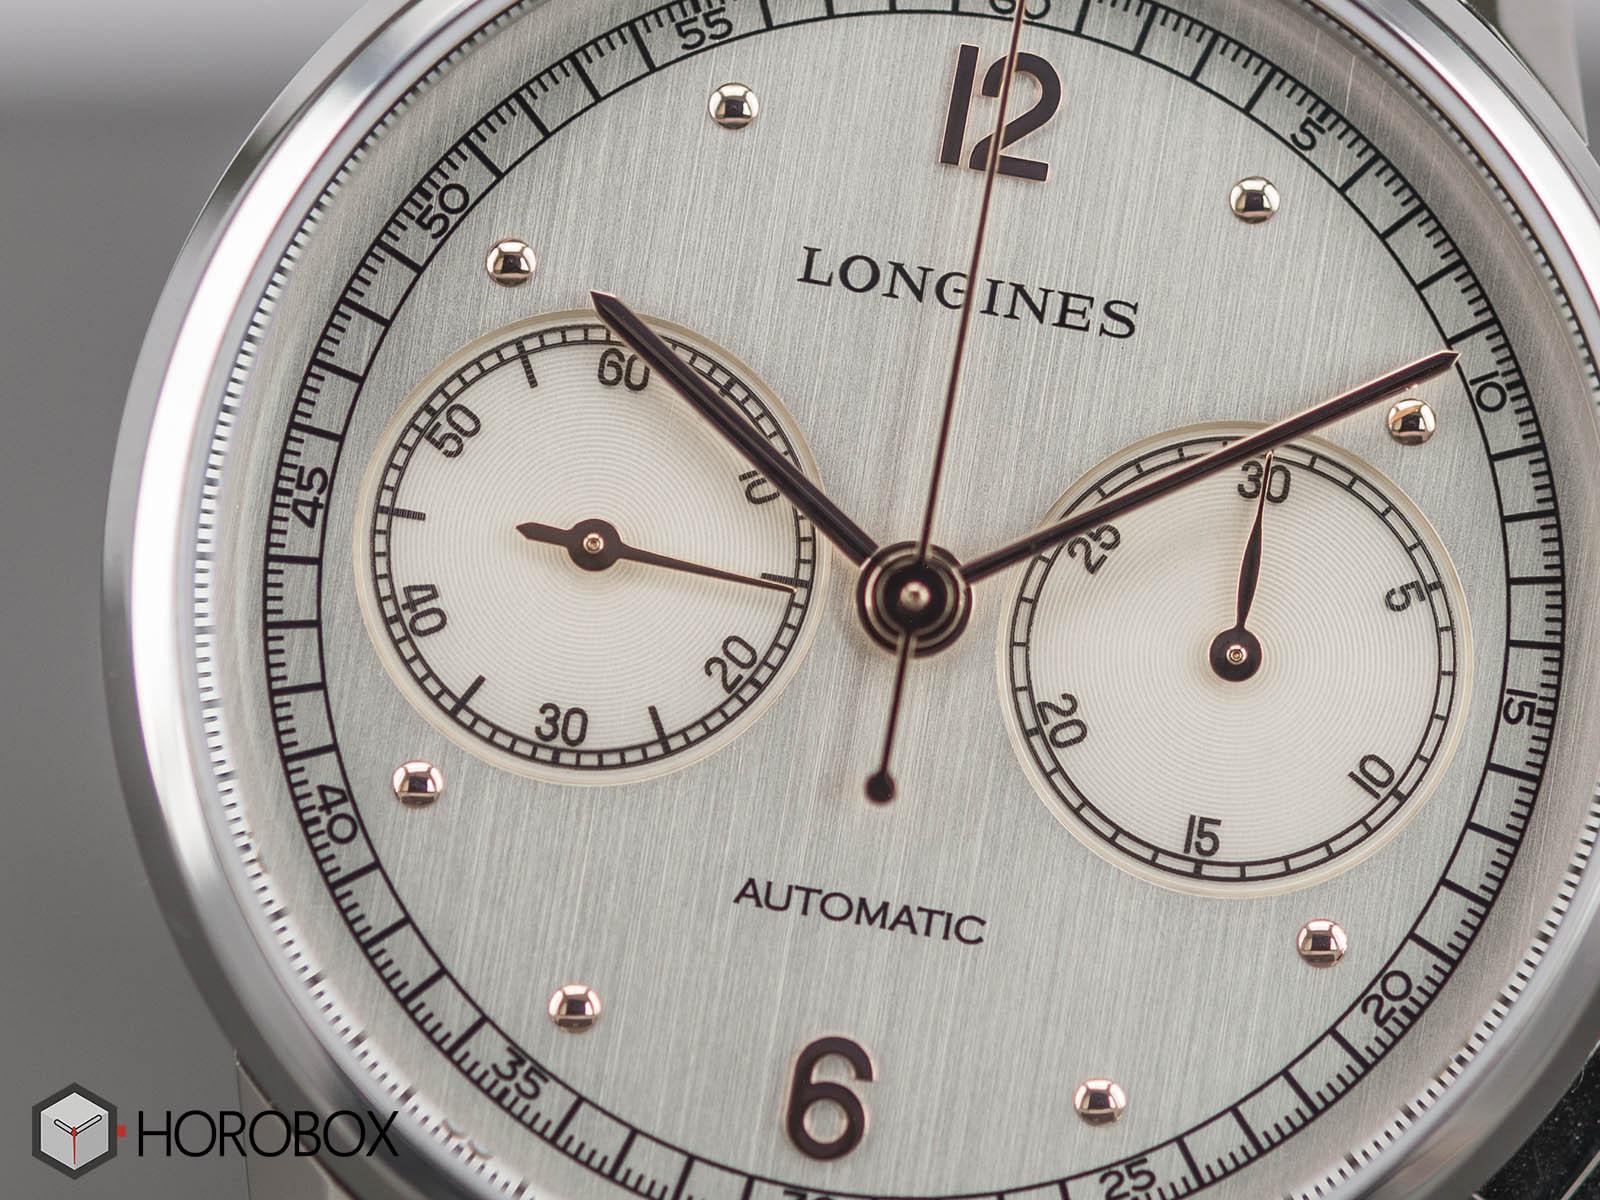 longines-heritage-chrono-1940-3-.jpg